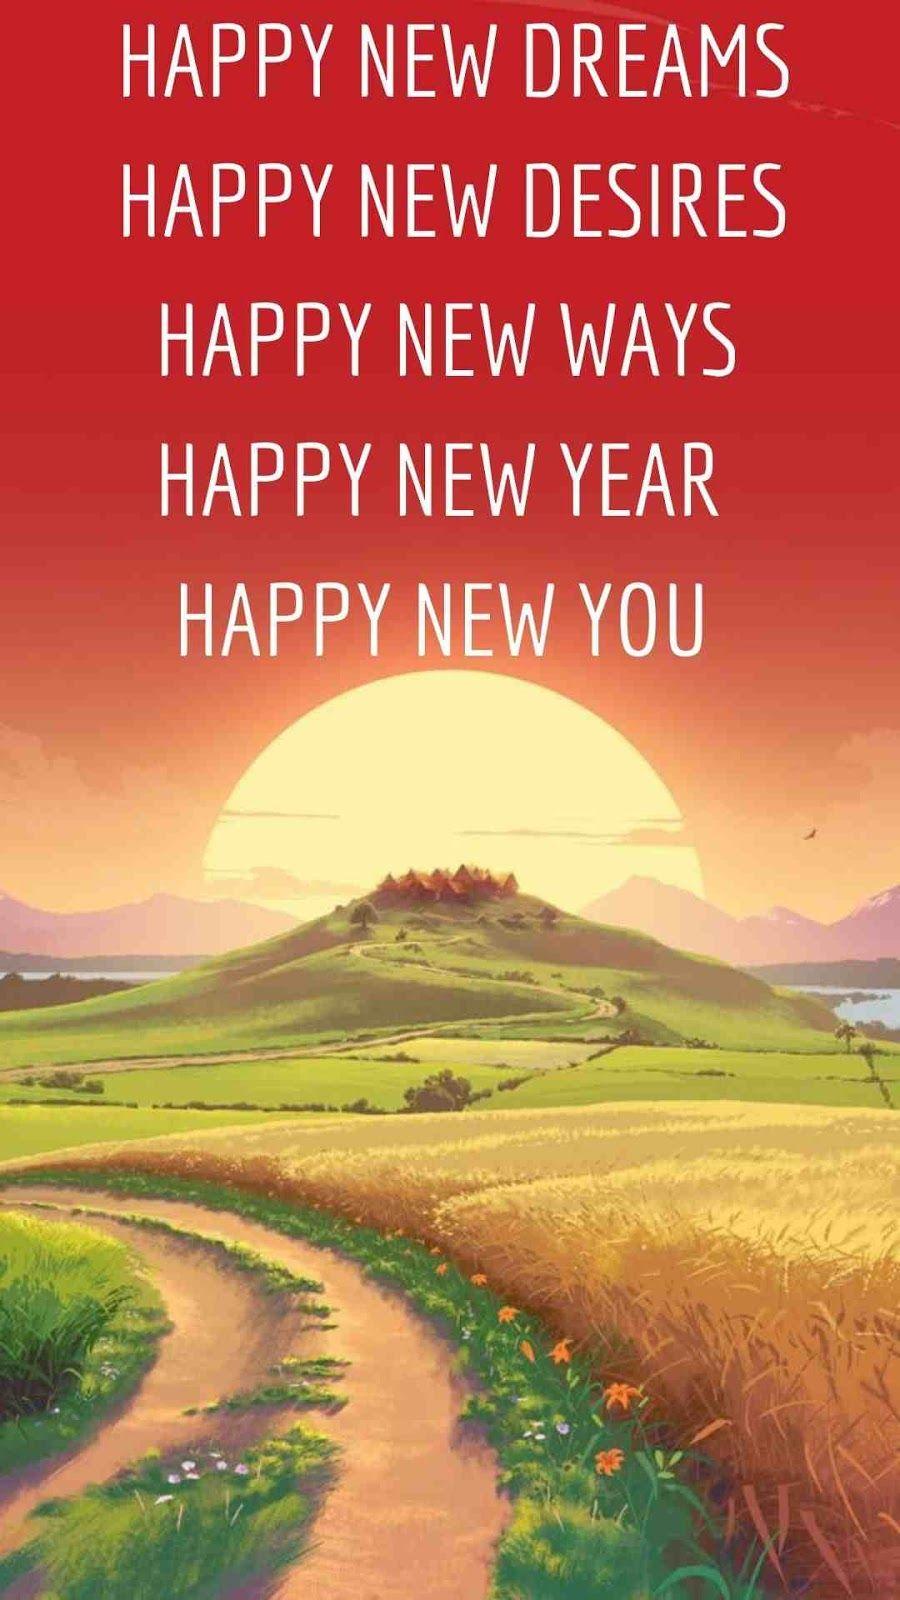 happynewyearhappynewyou2020 Happy new year quotes